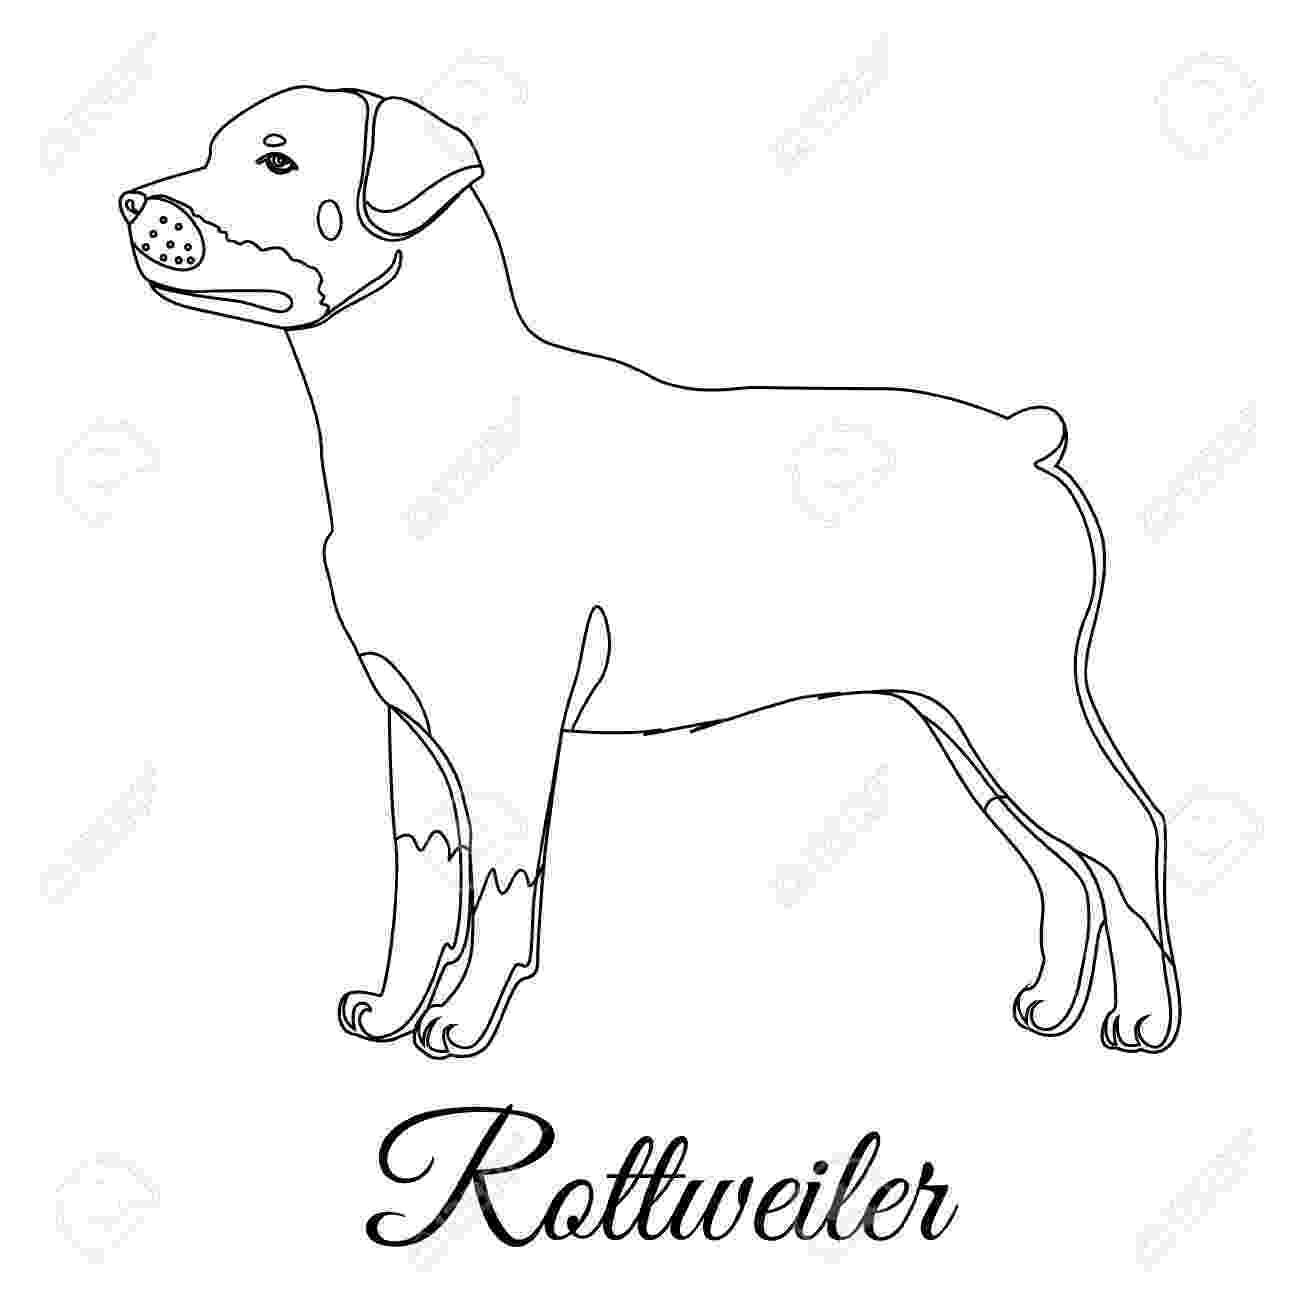 rottweiler coloring book pug tangle zentangle drawing pinterest tangled book rottweiler coloring